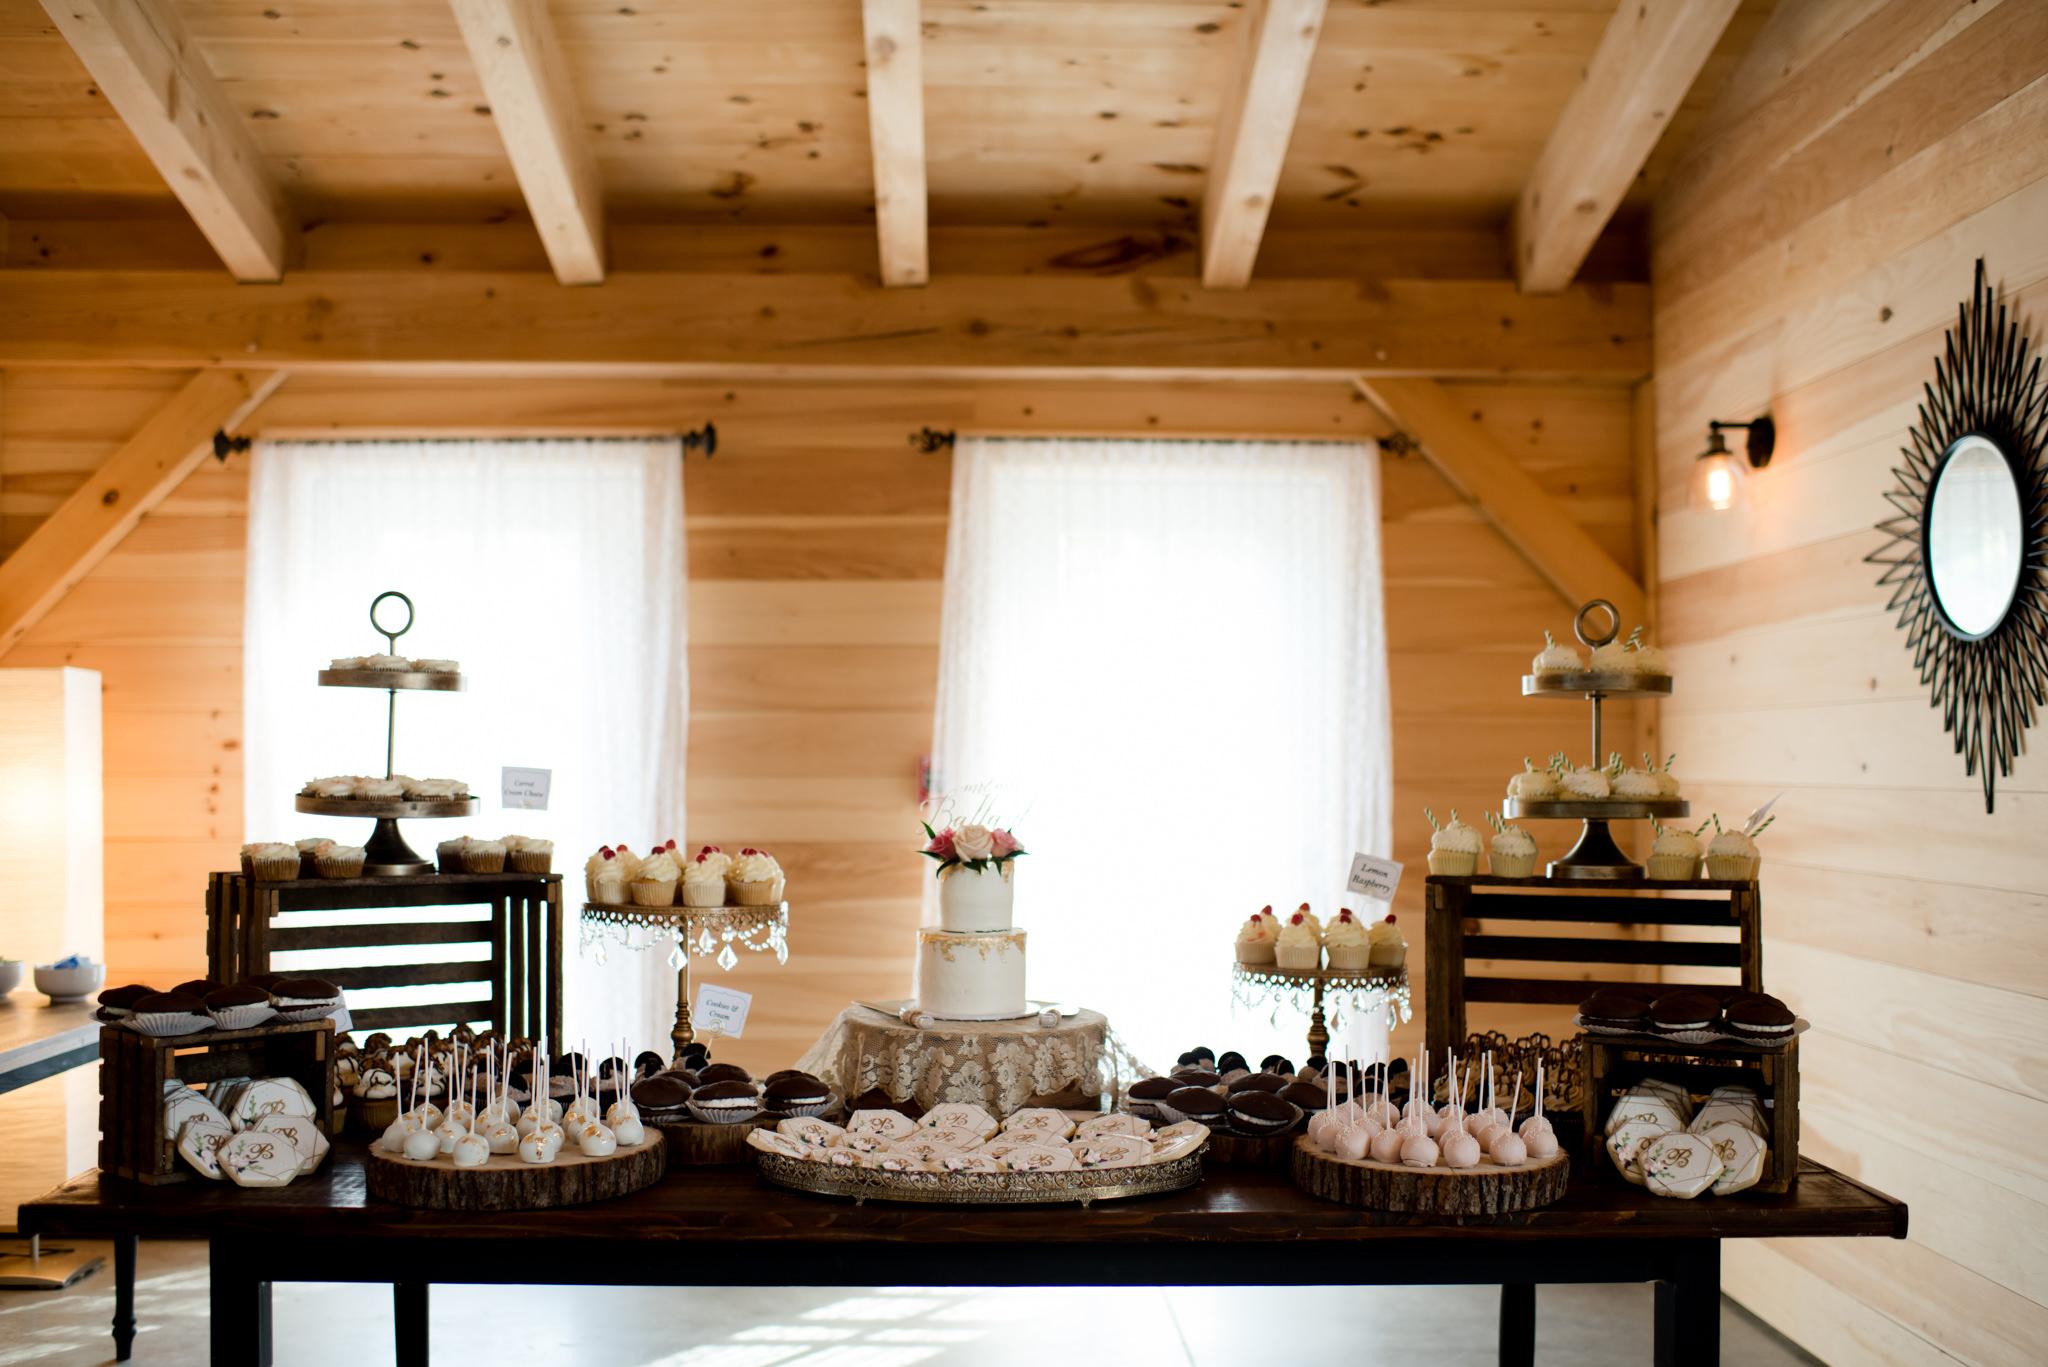 barn lights wedding table with decor